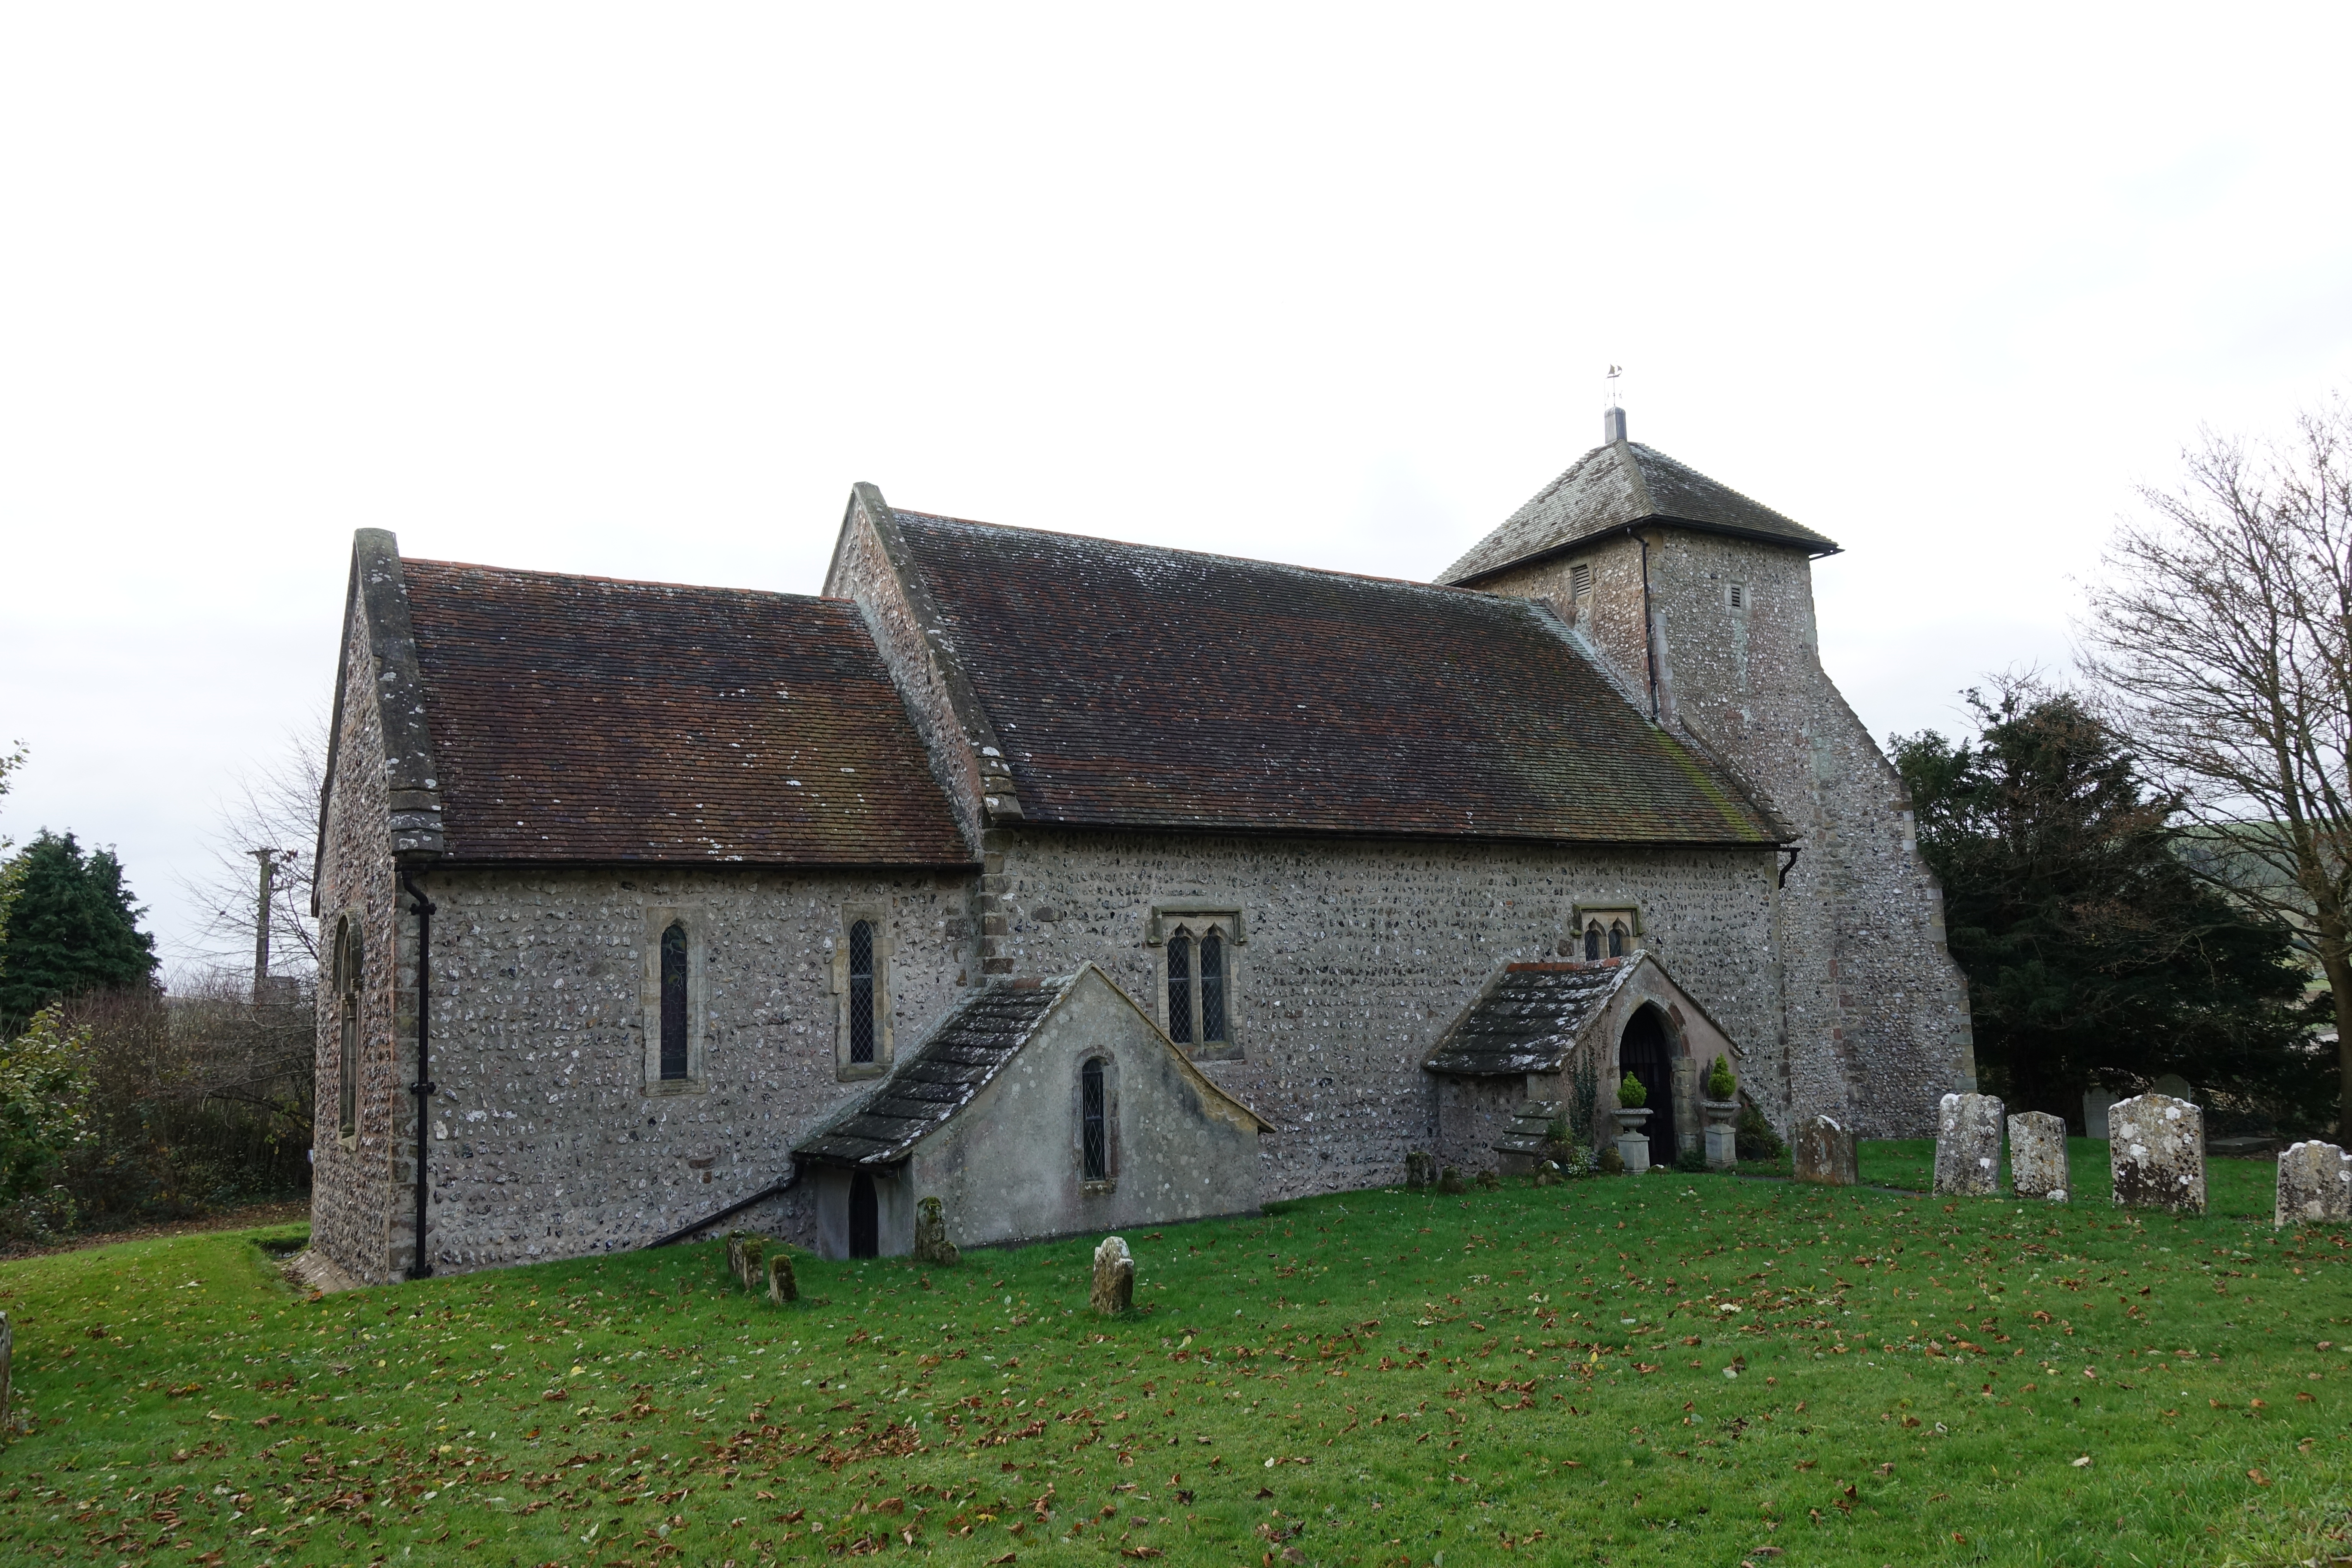 The Norman built Shepherds' Church, Pyecombe